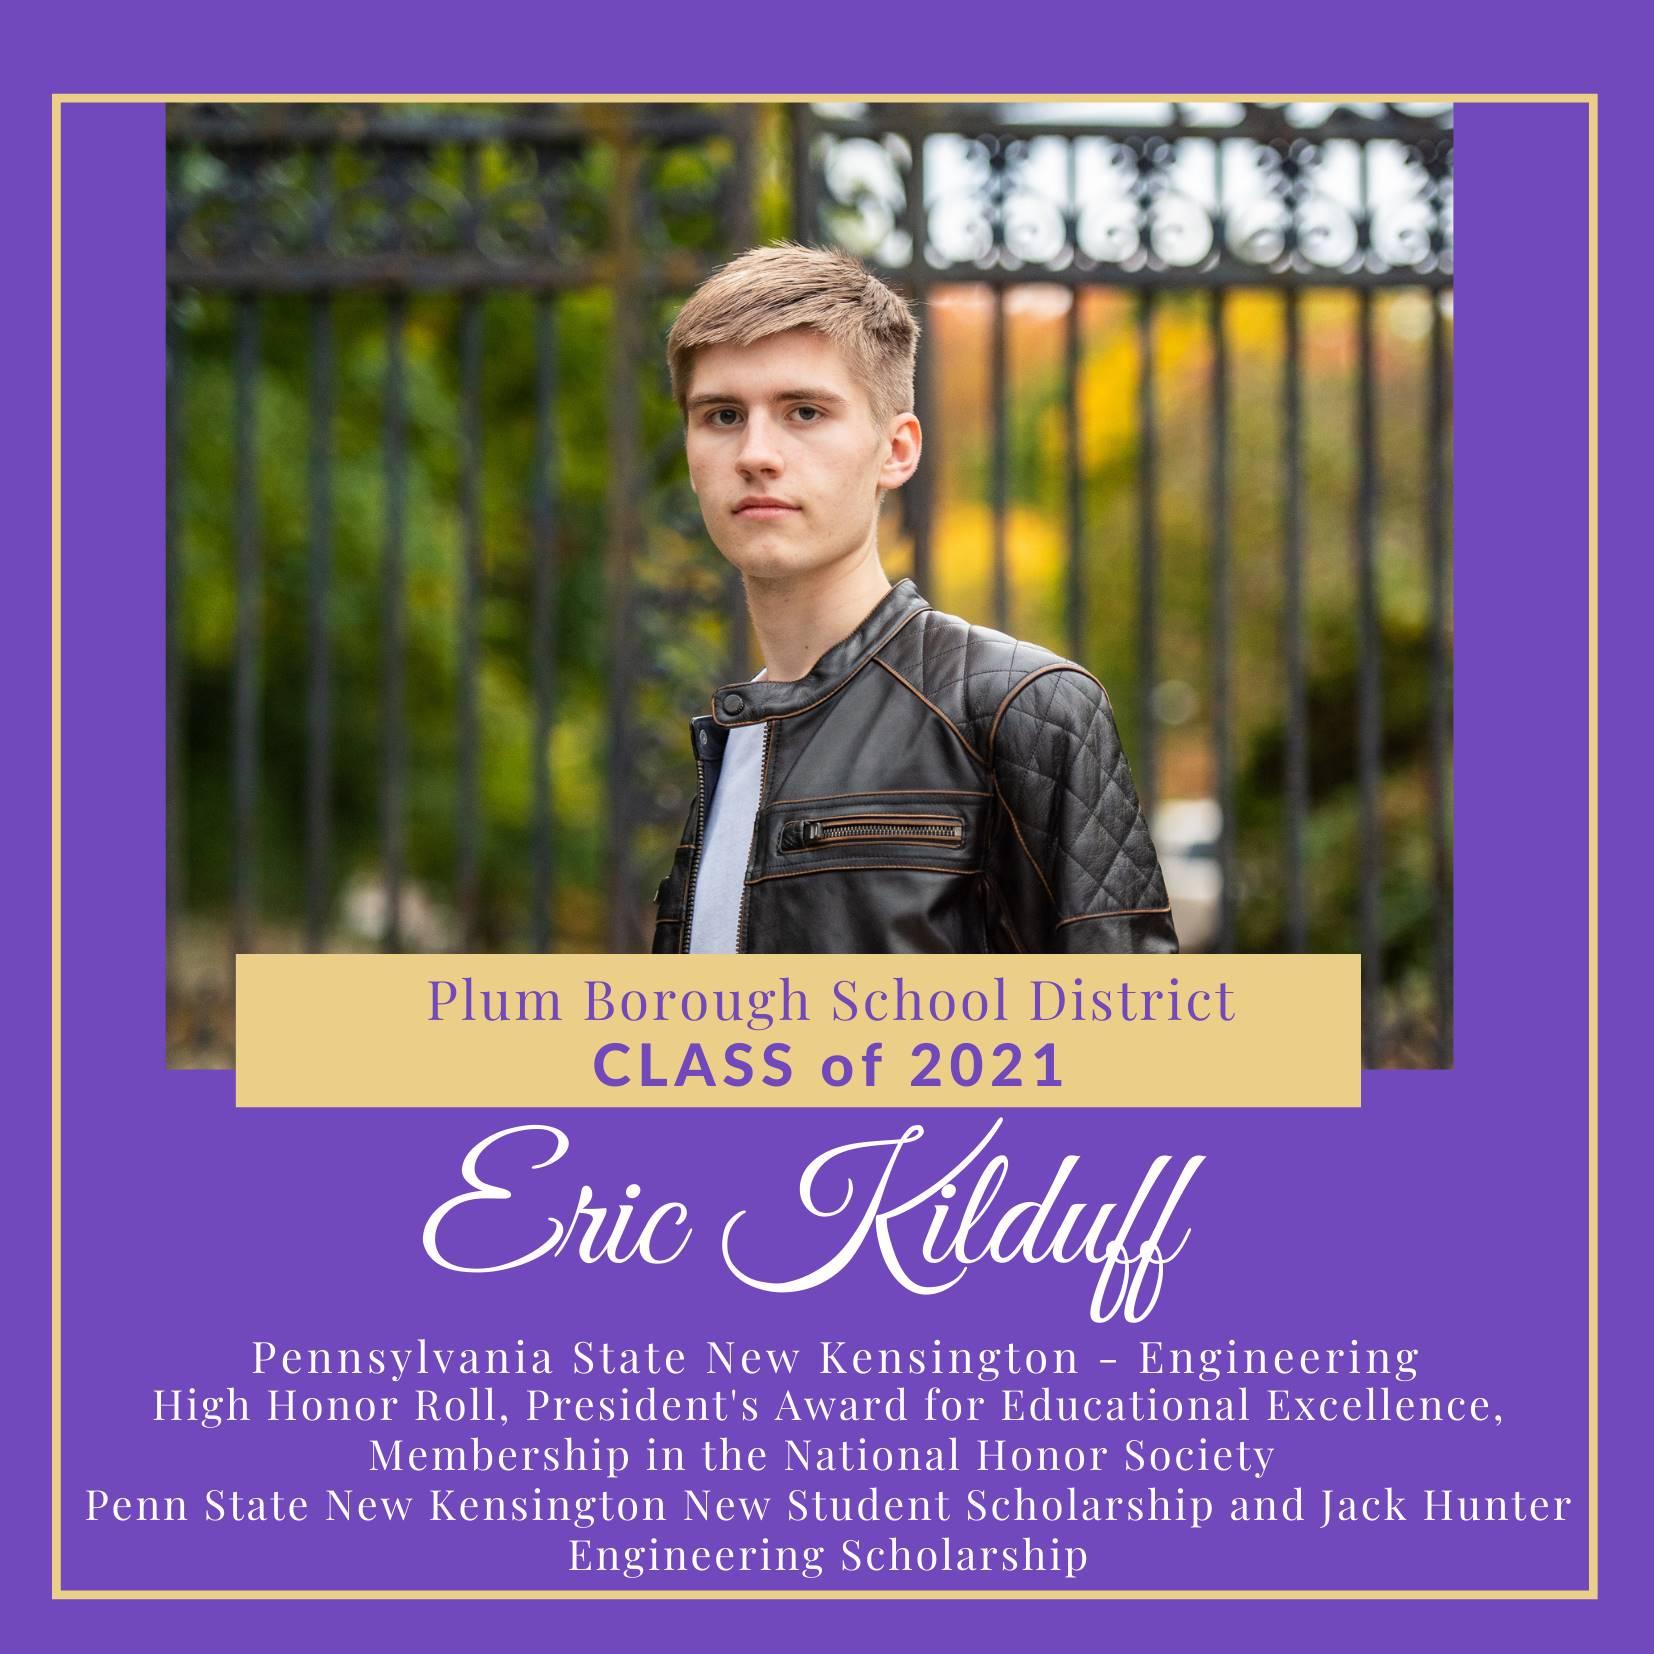 Congratulations to Eric Kilduff, Class of 2021!